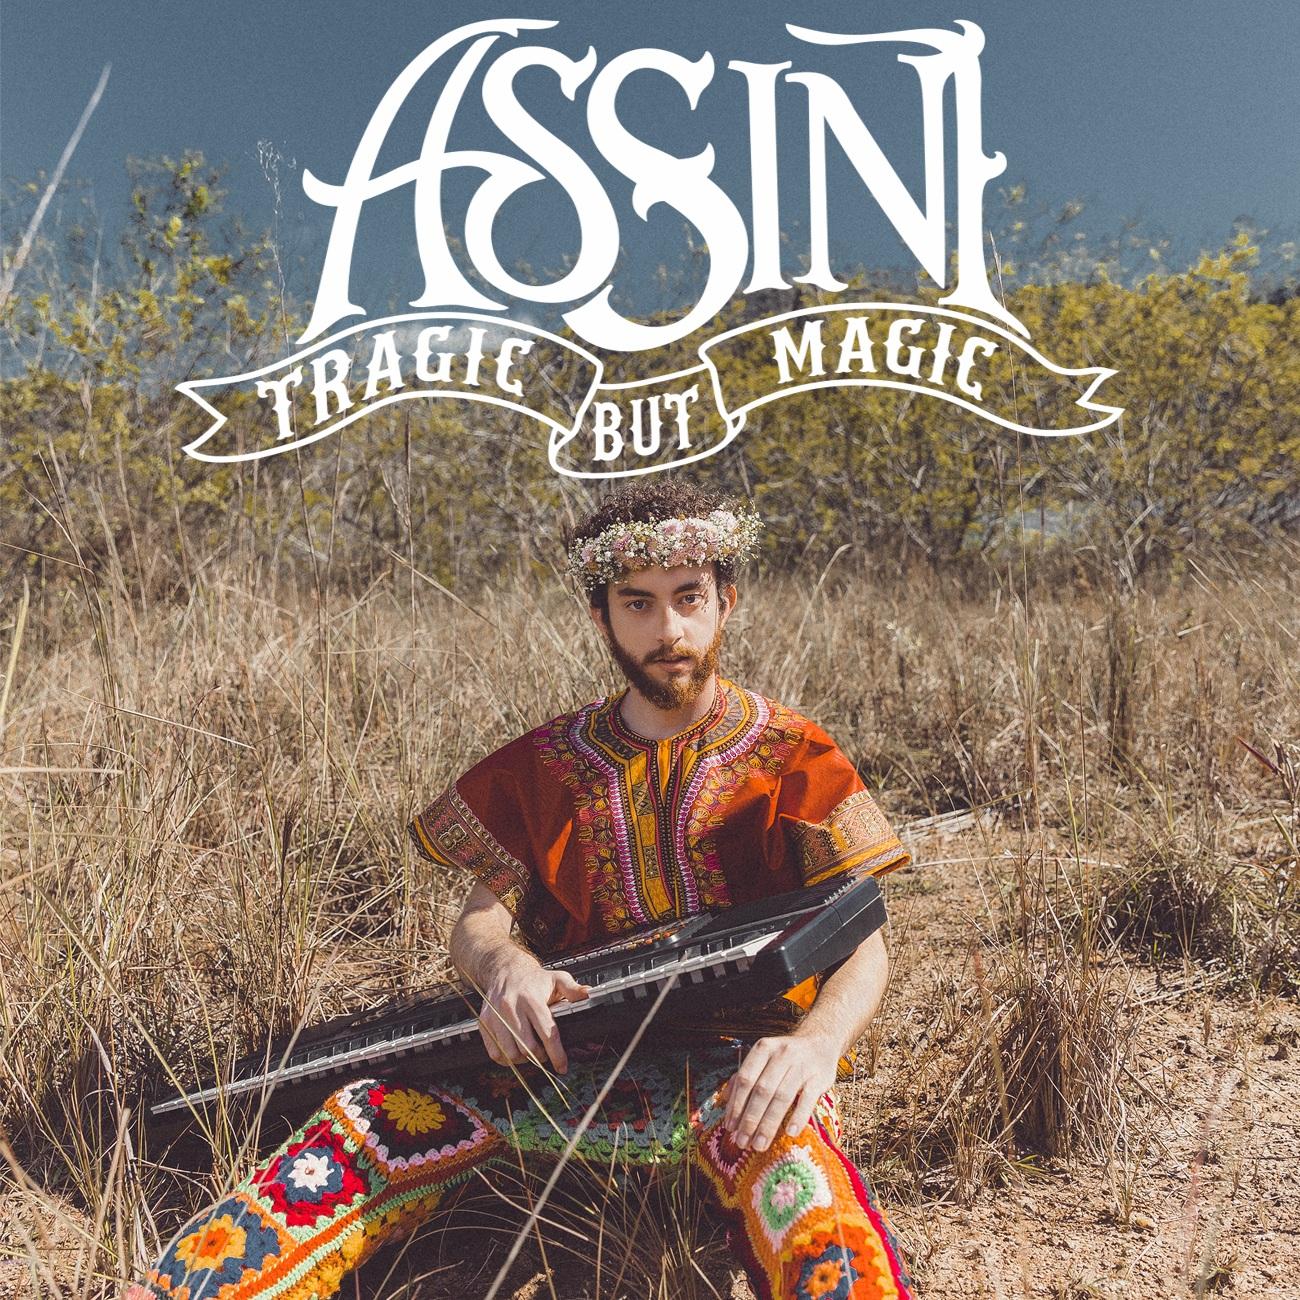 Assini - Tragic but Magic, capa.